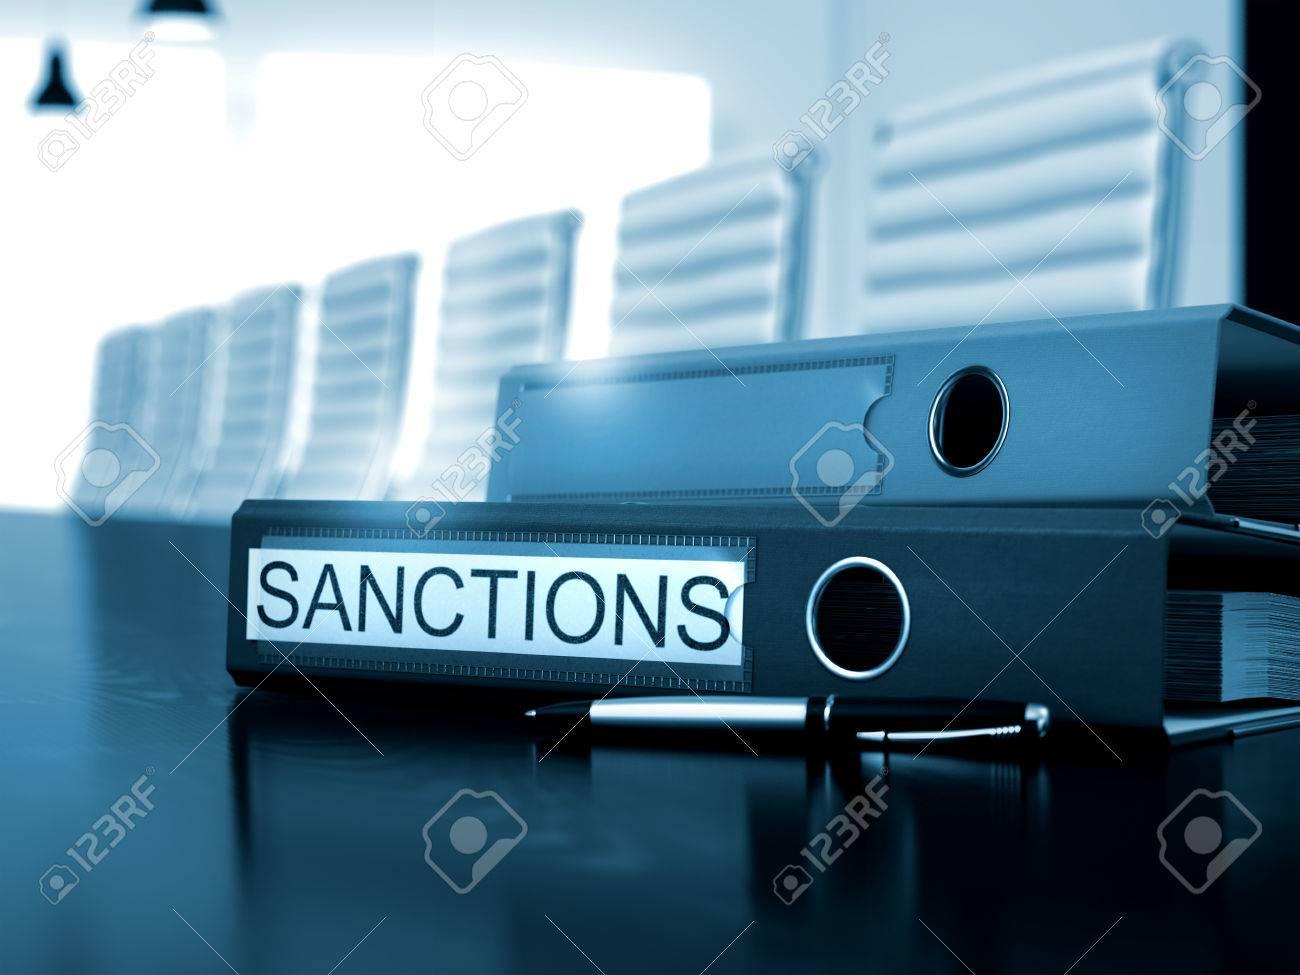 Sanctions - Concept. File Folder with Inscription Sanctions on Wooden Office Table. Sanctions - Office Folder on Working Desktop. Sanctions. Concept on Toned Background. 3D. - 53199874